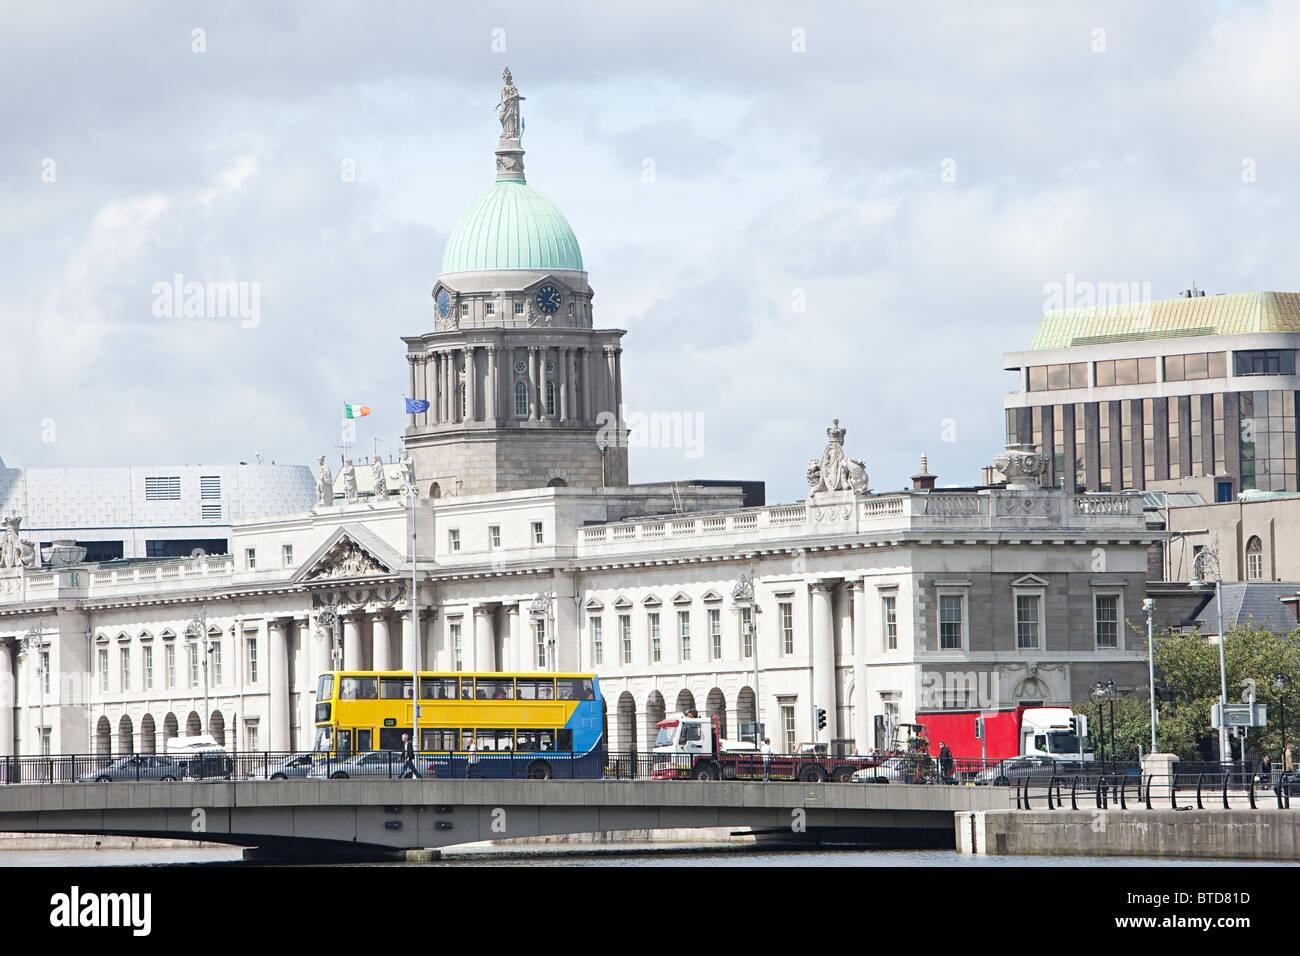 The Custom House and Georges Quay, Dublin, Ireland - Stock Image